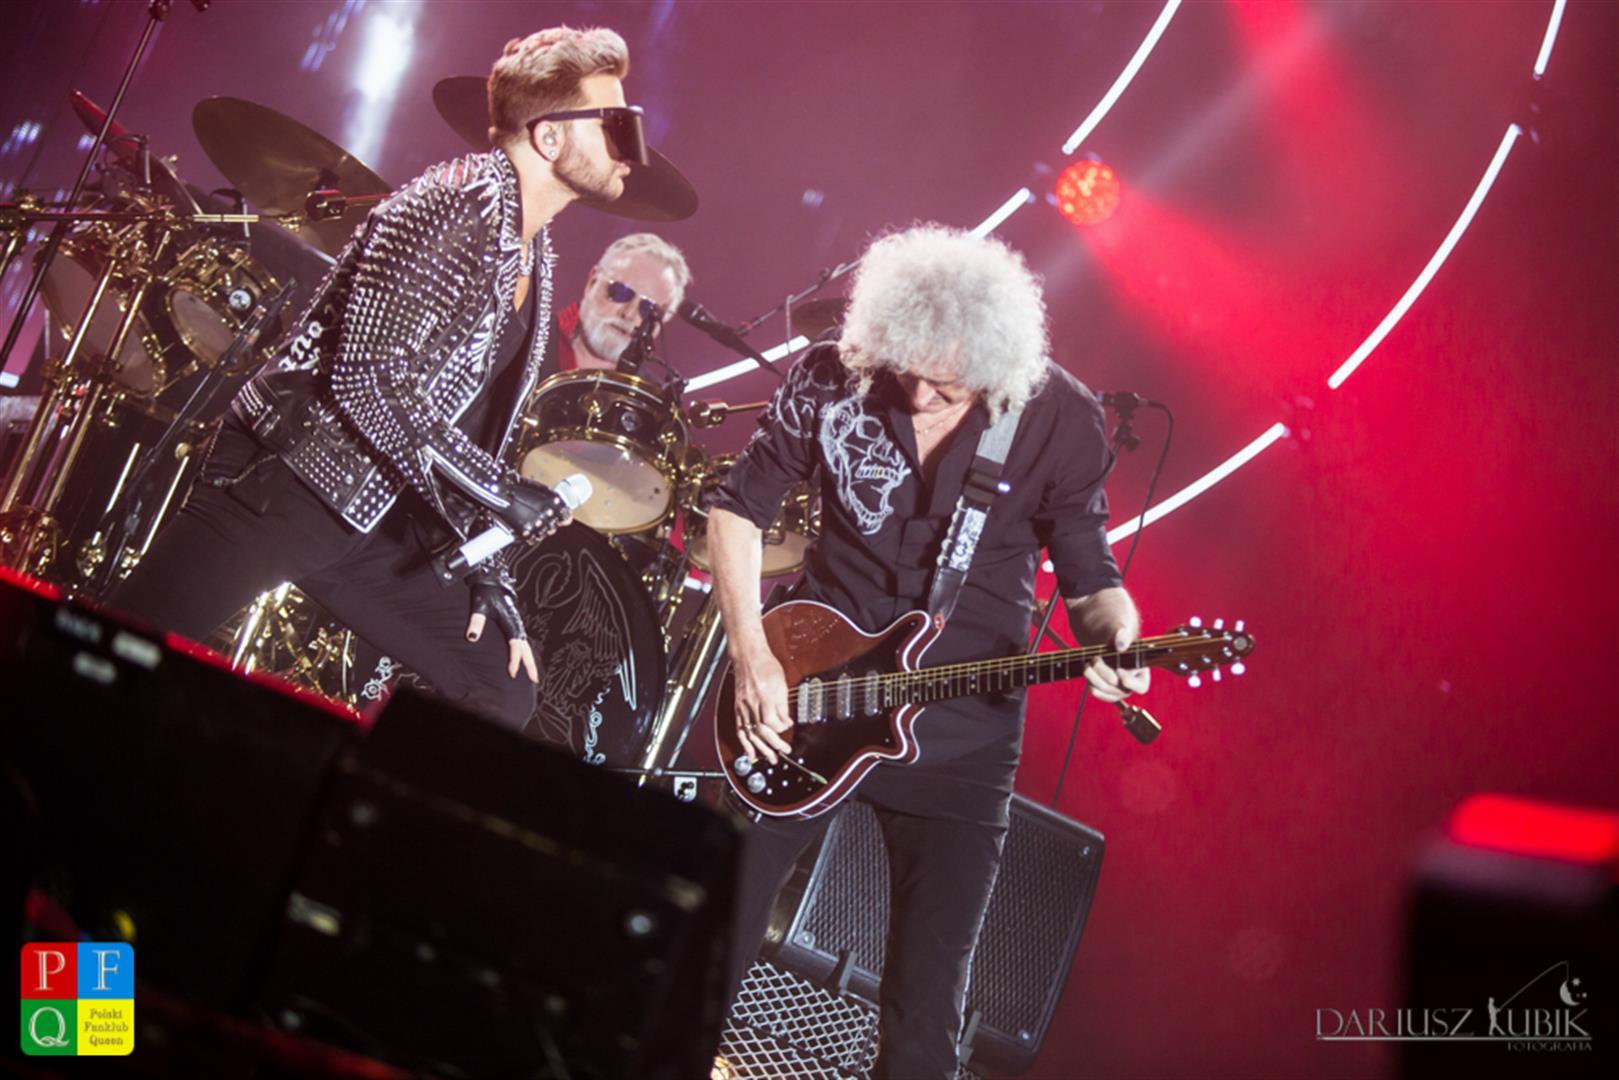 LFO 2016 Queen+Adam Lambert Dariusz Kubik --009